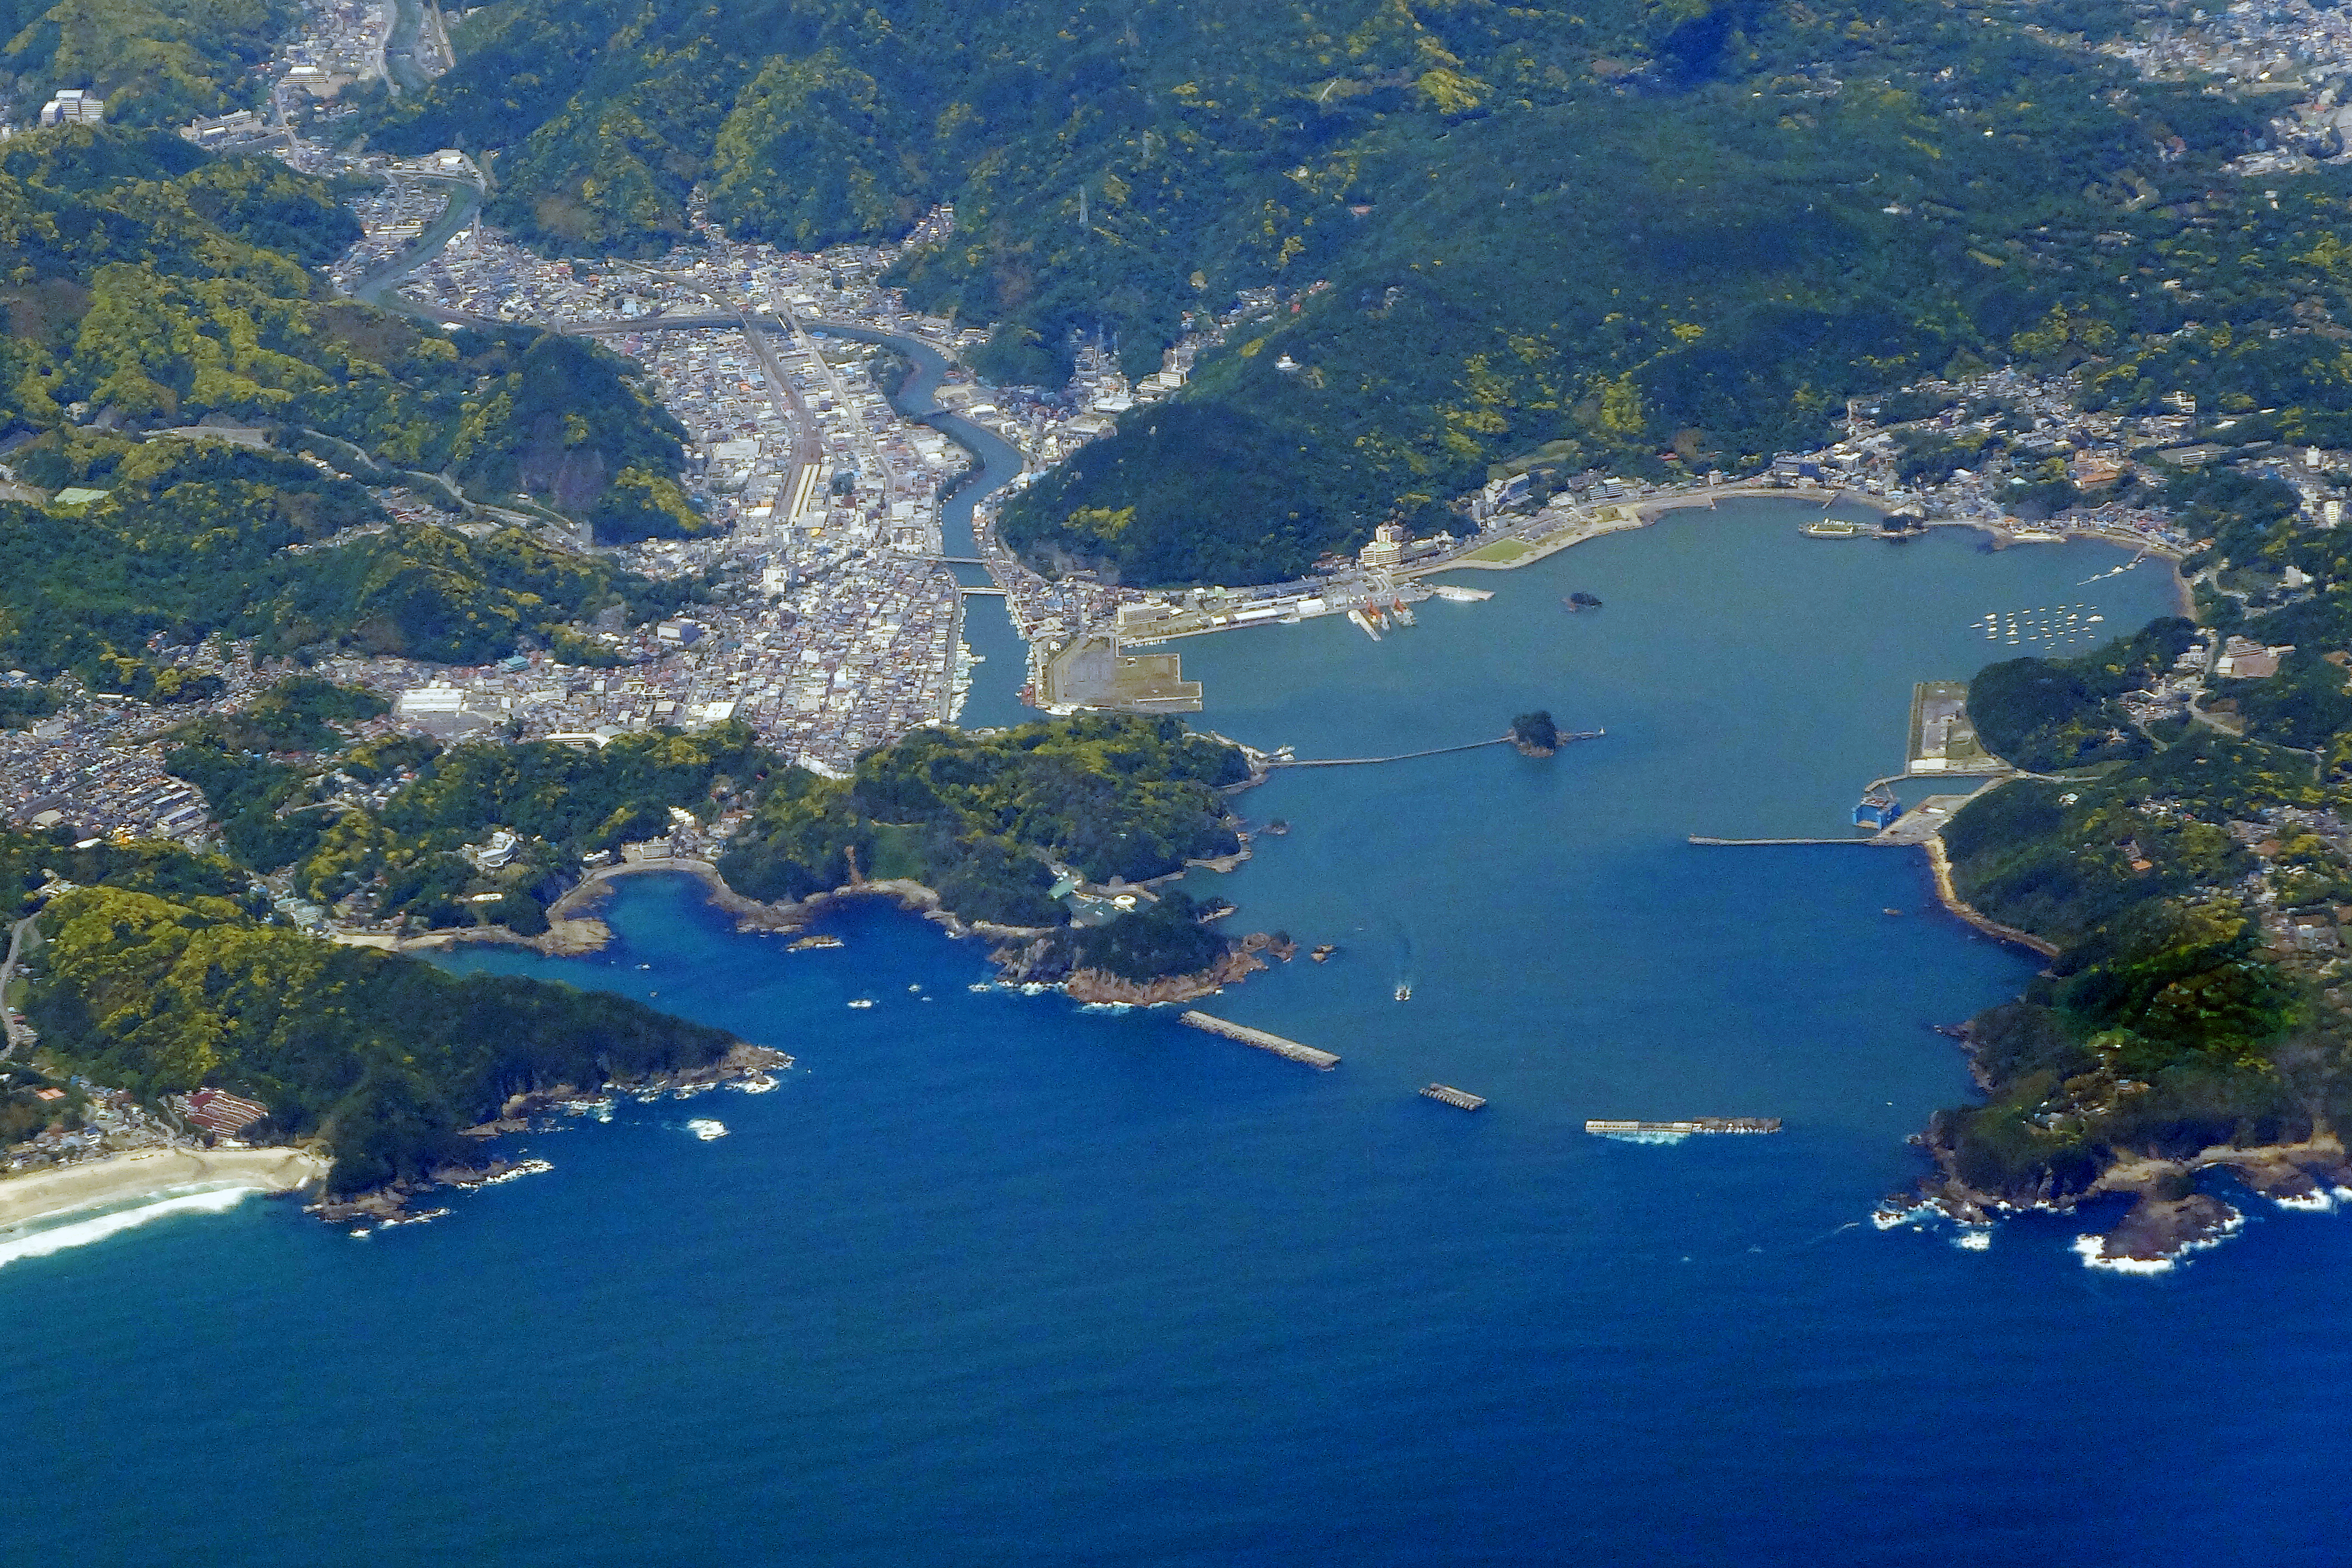 Shizuoka Japan  city photos gallery : 下田観光船でクルージングに行こう!下田から黒船 ...